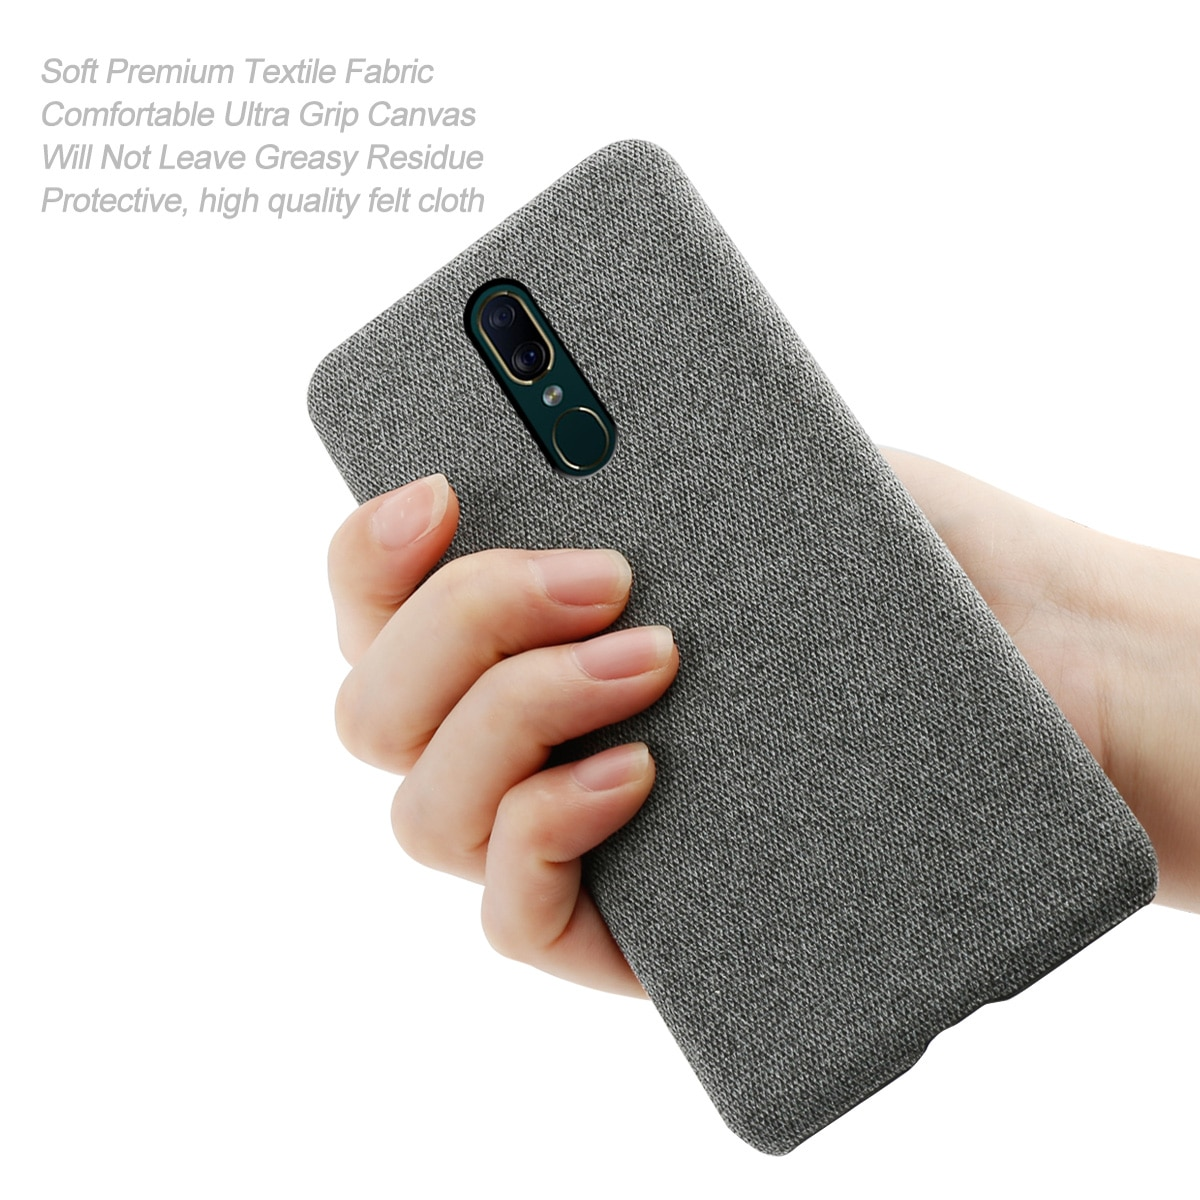 Funda protectora para teléfono móvil OPPO F11, funda trasera delgada, dura, PC, tela tejida, tela de fieltro, funda protectora para OPPO F11, funda antiarañazos